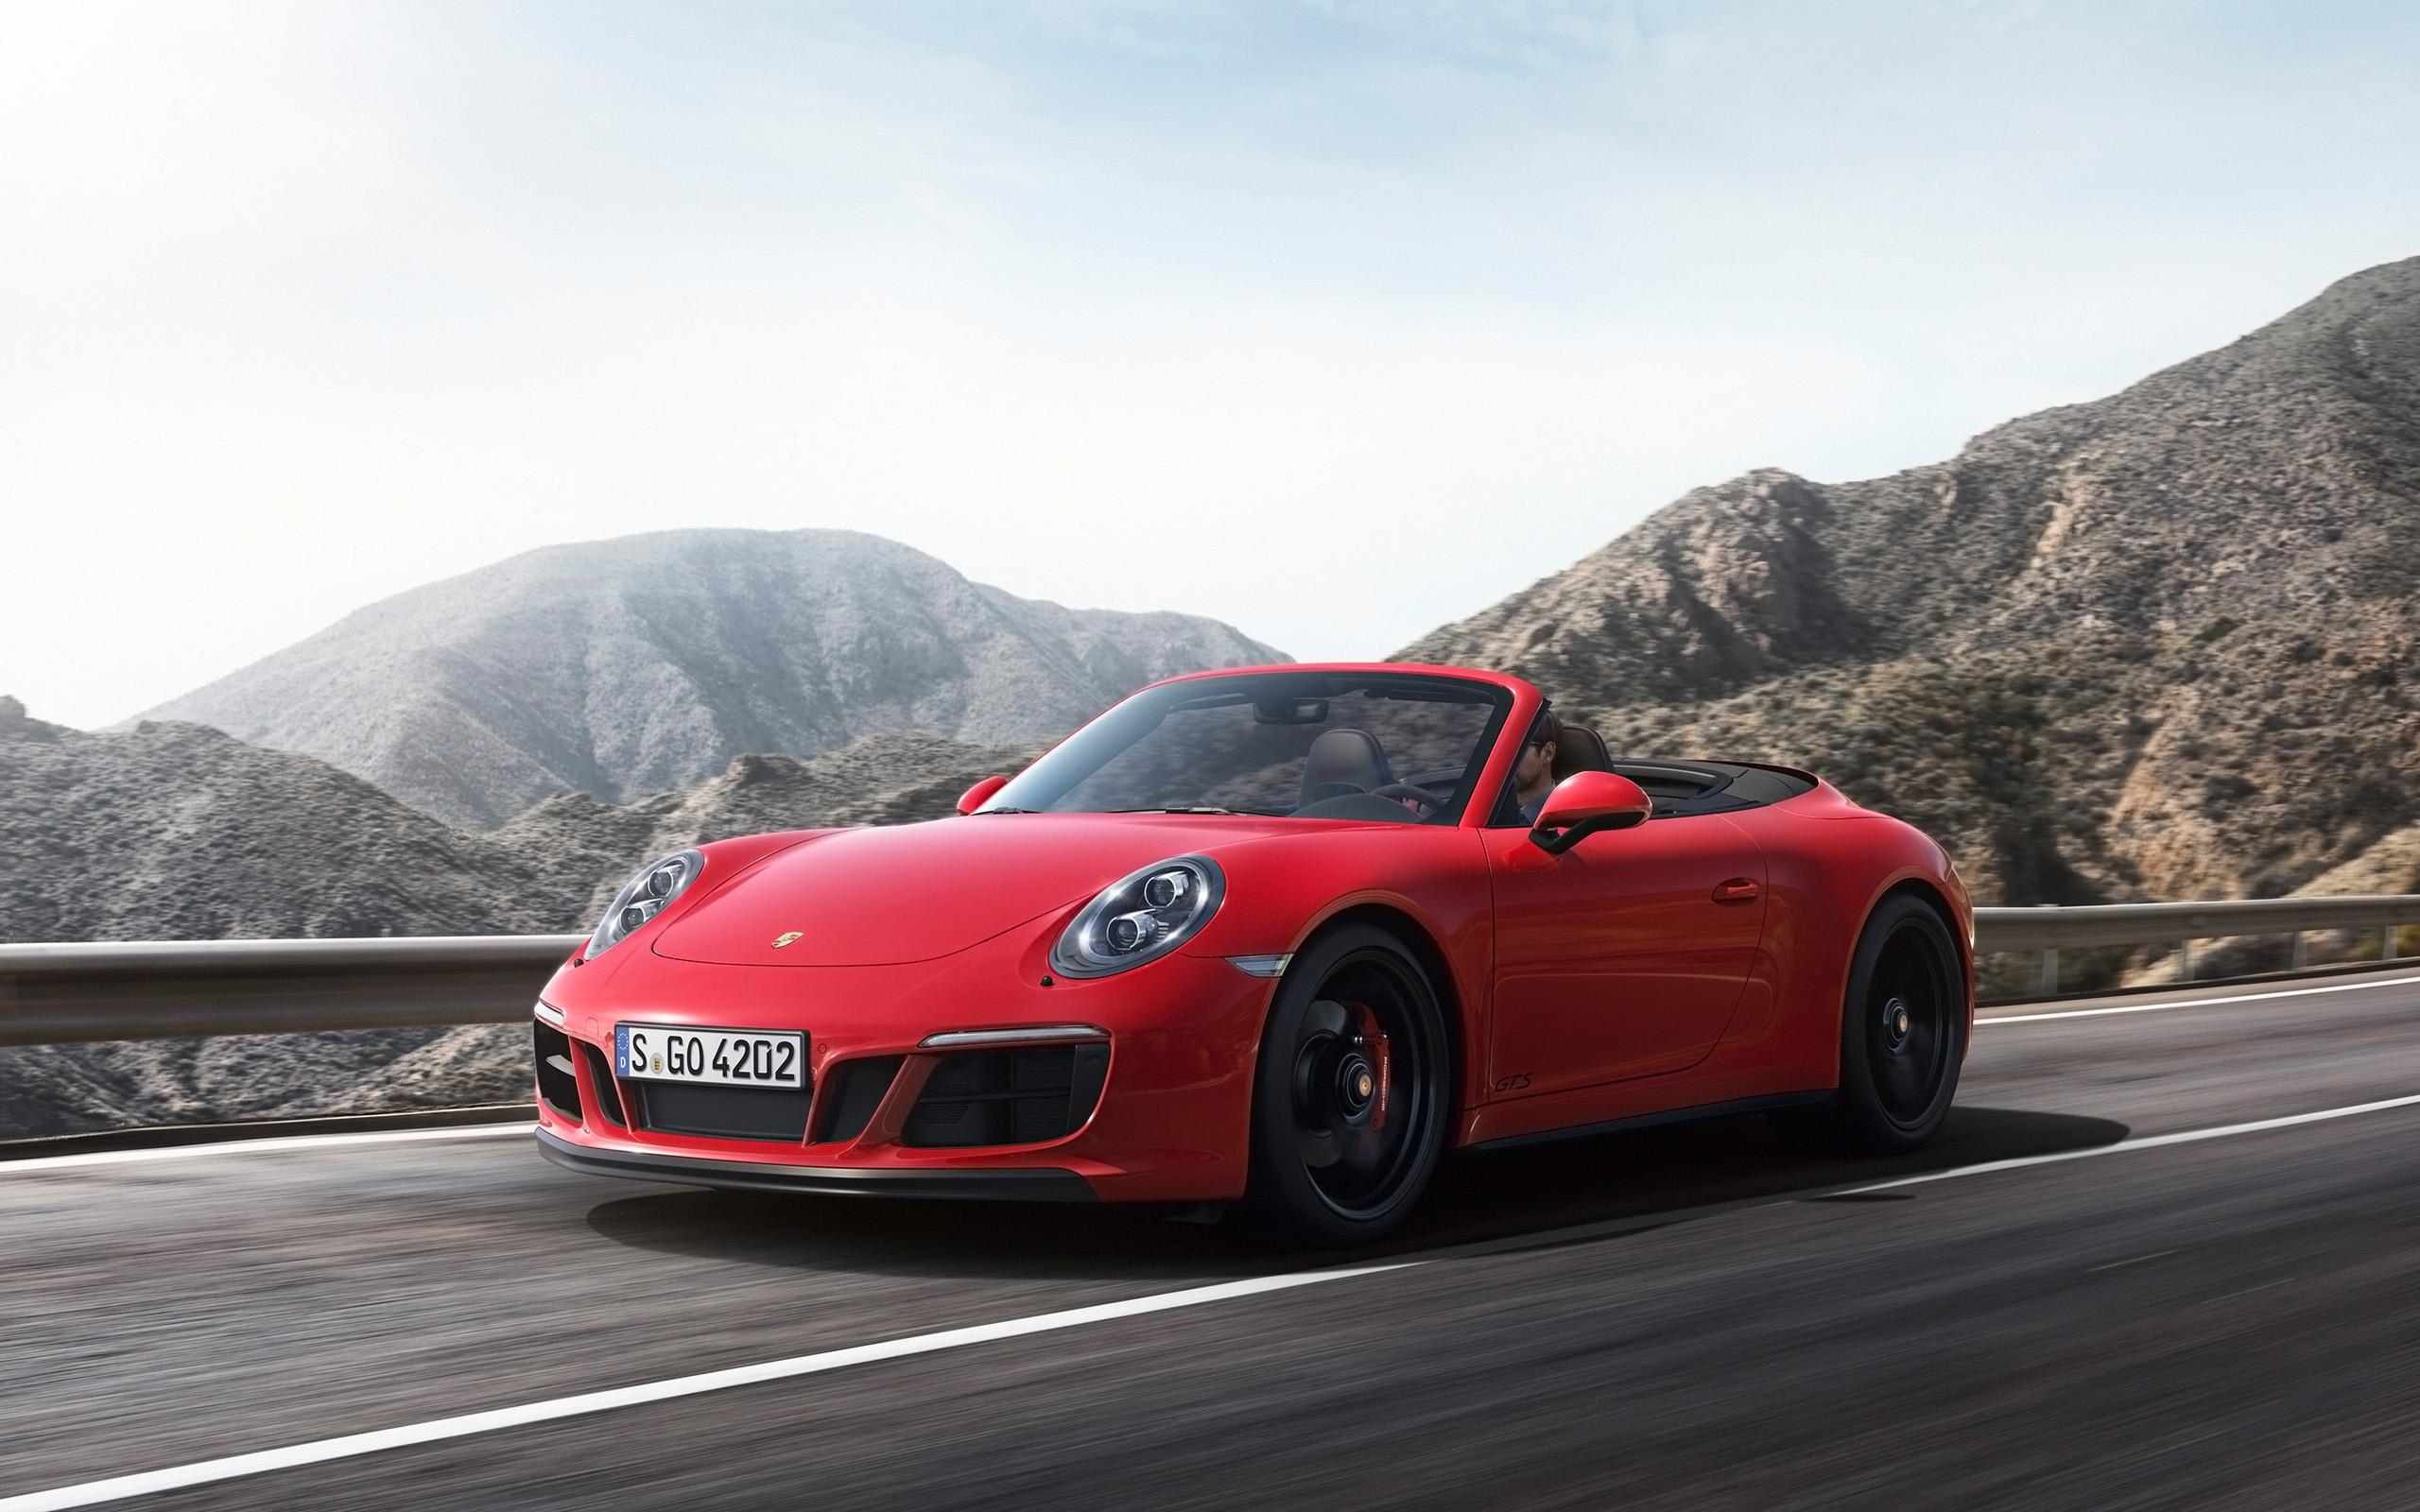 2017 Porsche 911 GTS   Carrera 4 GTS Cabriolet   1   2560x1600 2560x1600